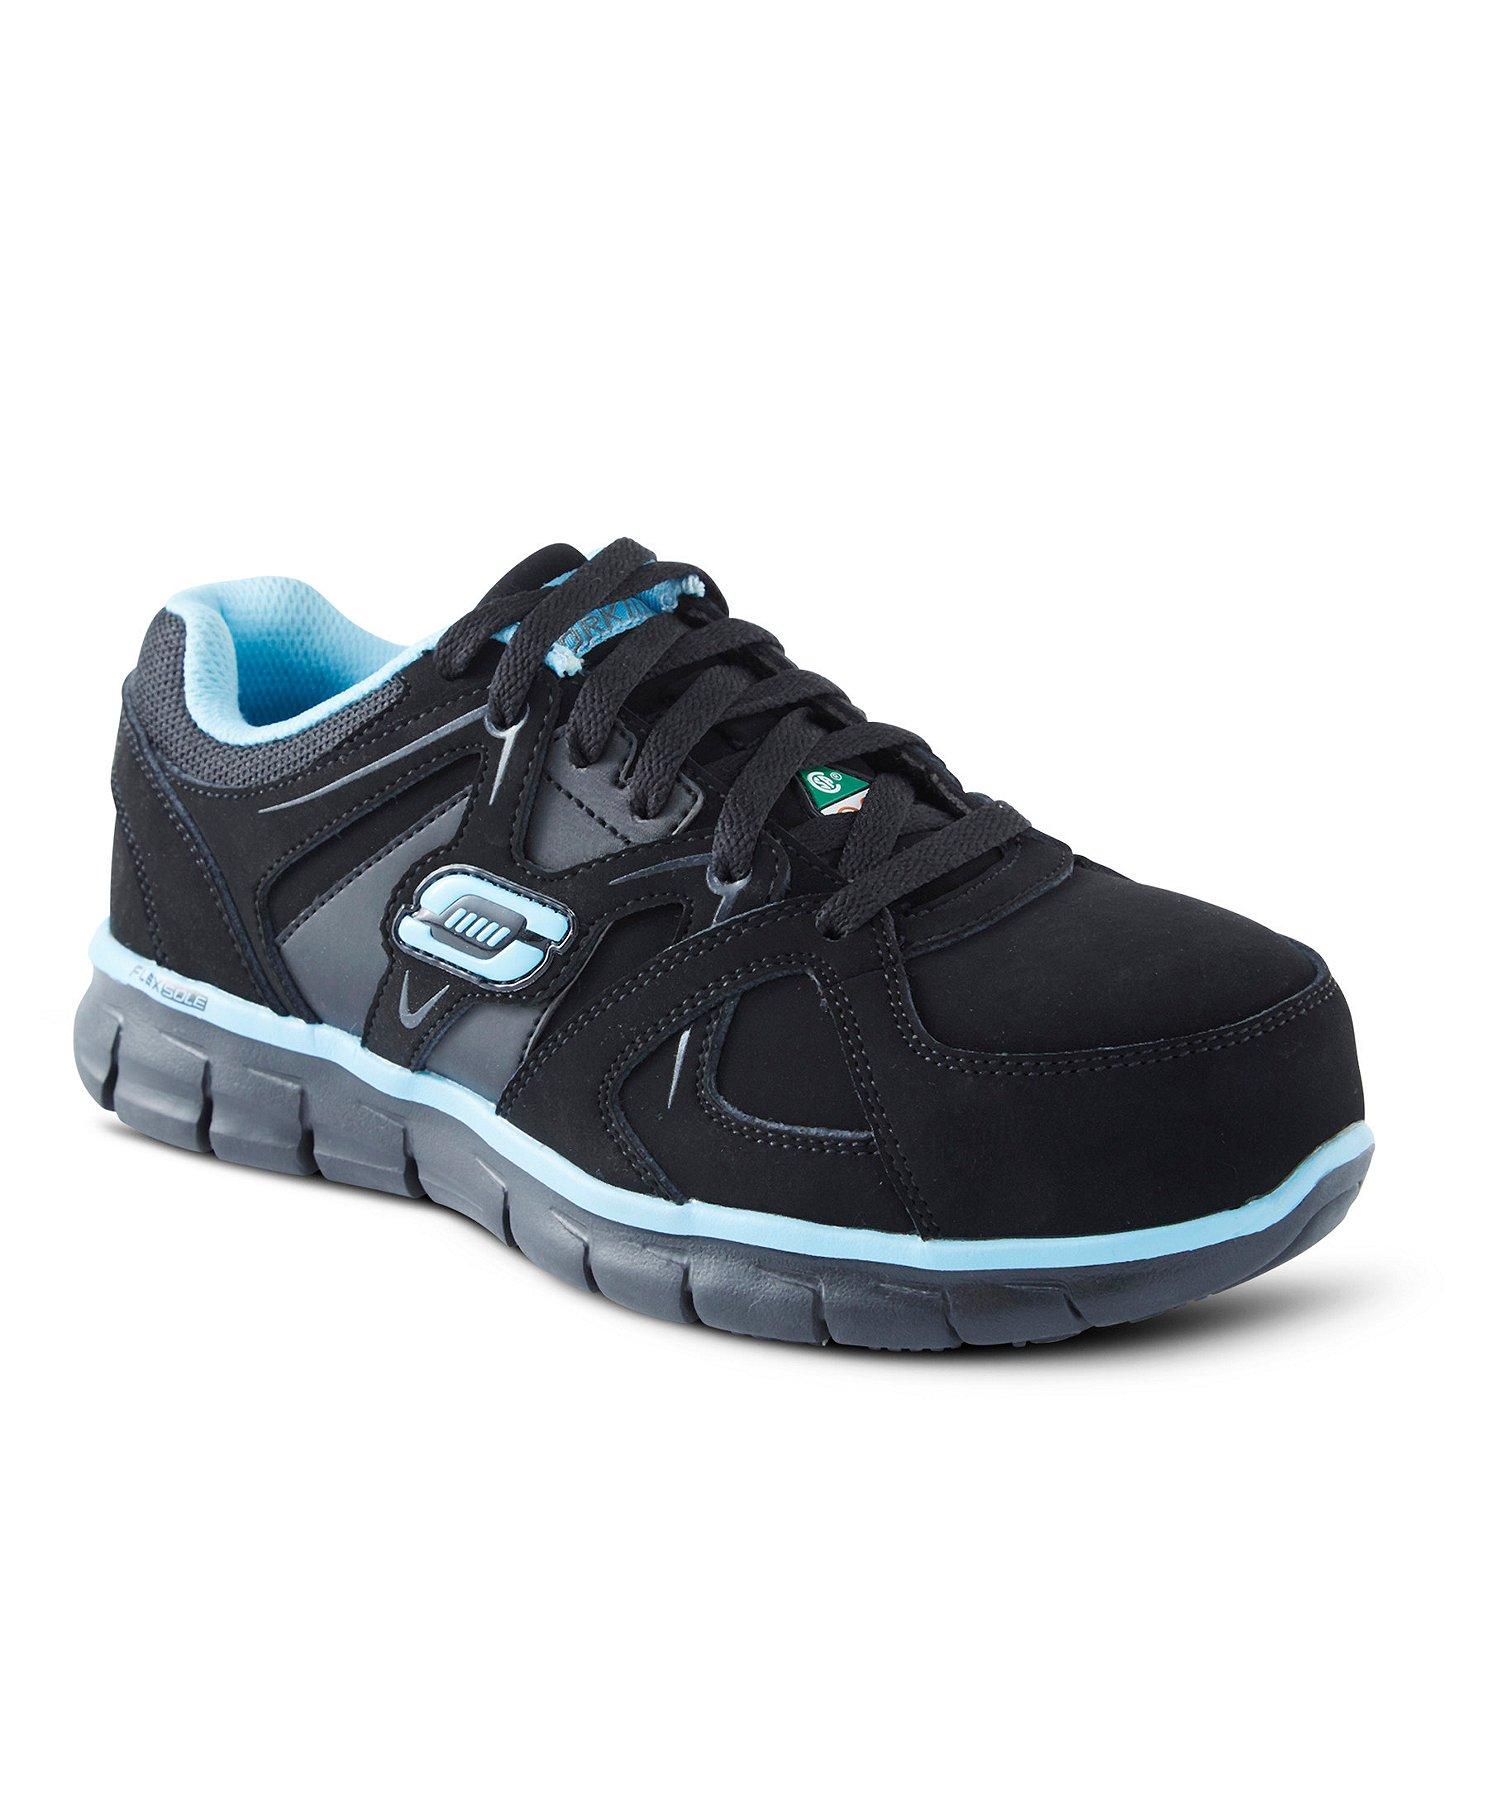 Women's Aluminum Toe Steel Plate Work Athletic Slip Resistant Shoes